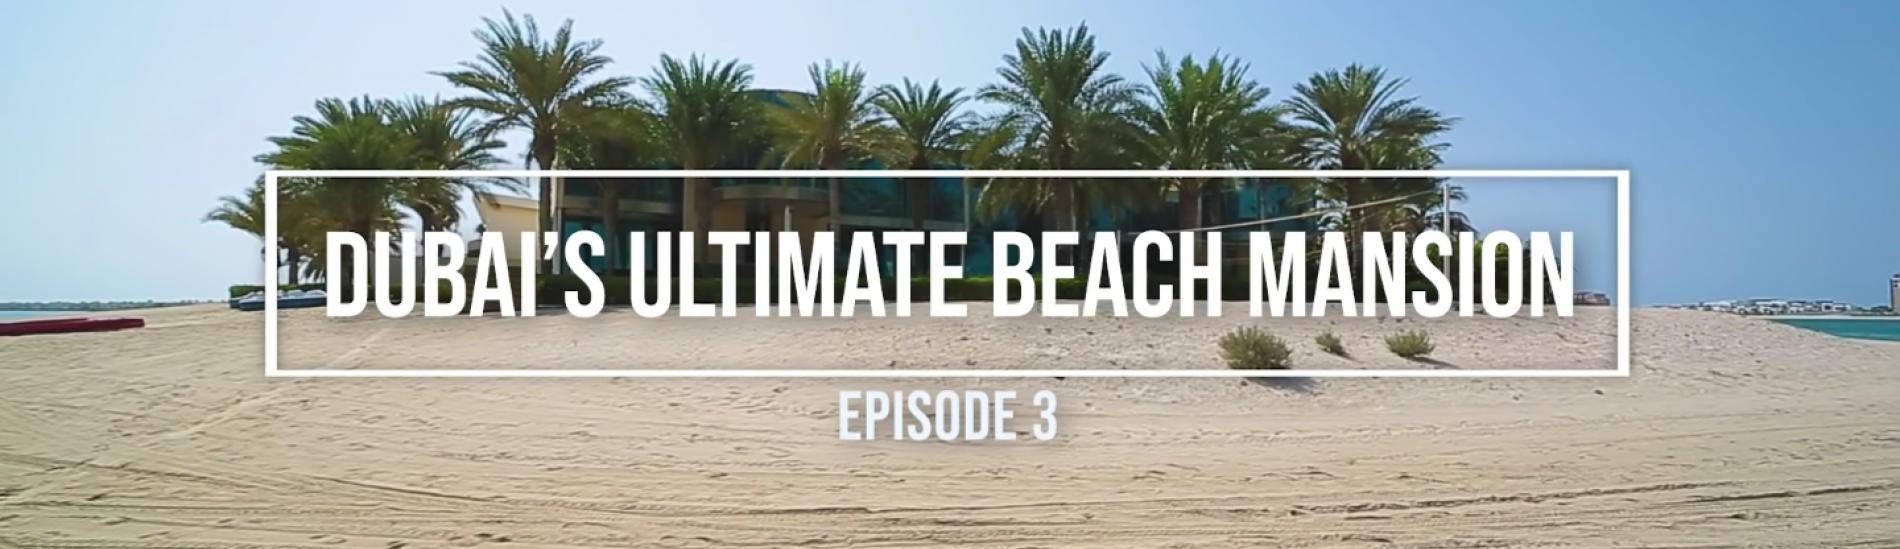 Episode 3 - Dubai's Ultimate $55 Million Beach Mansion